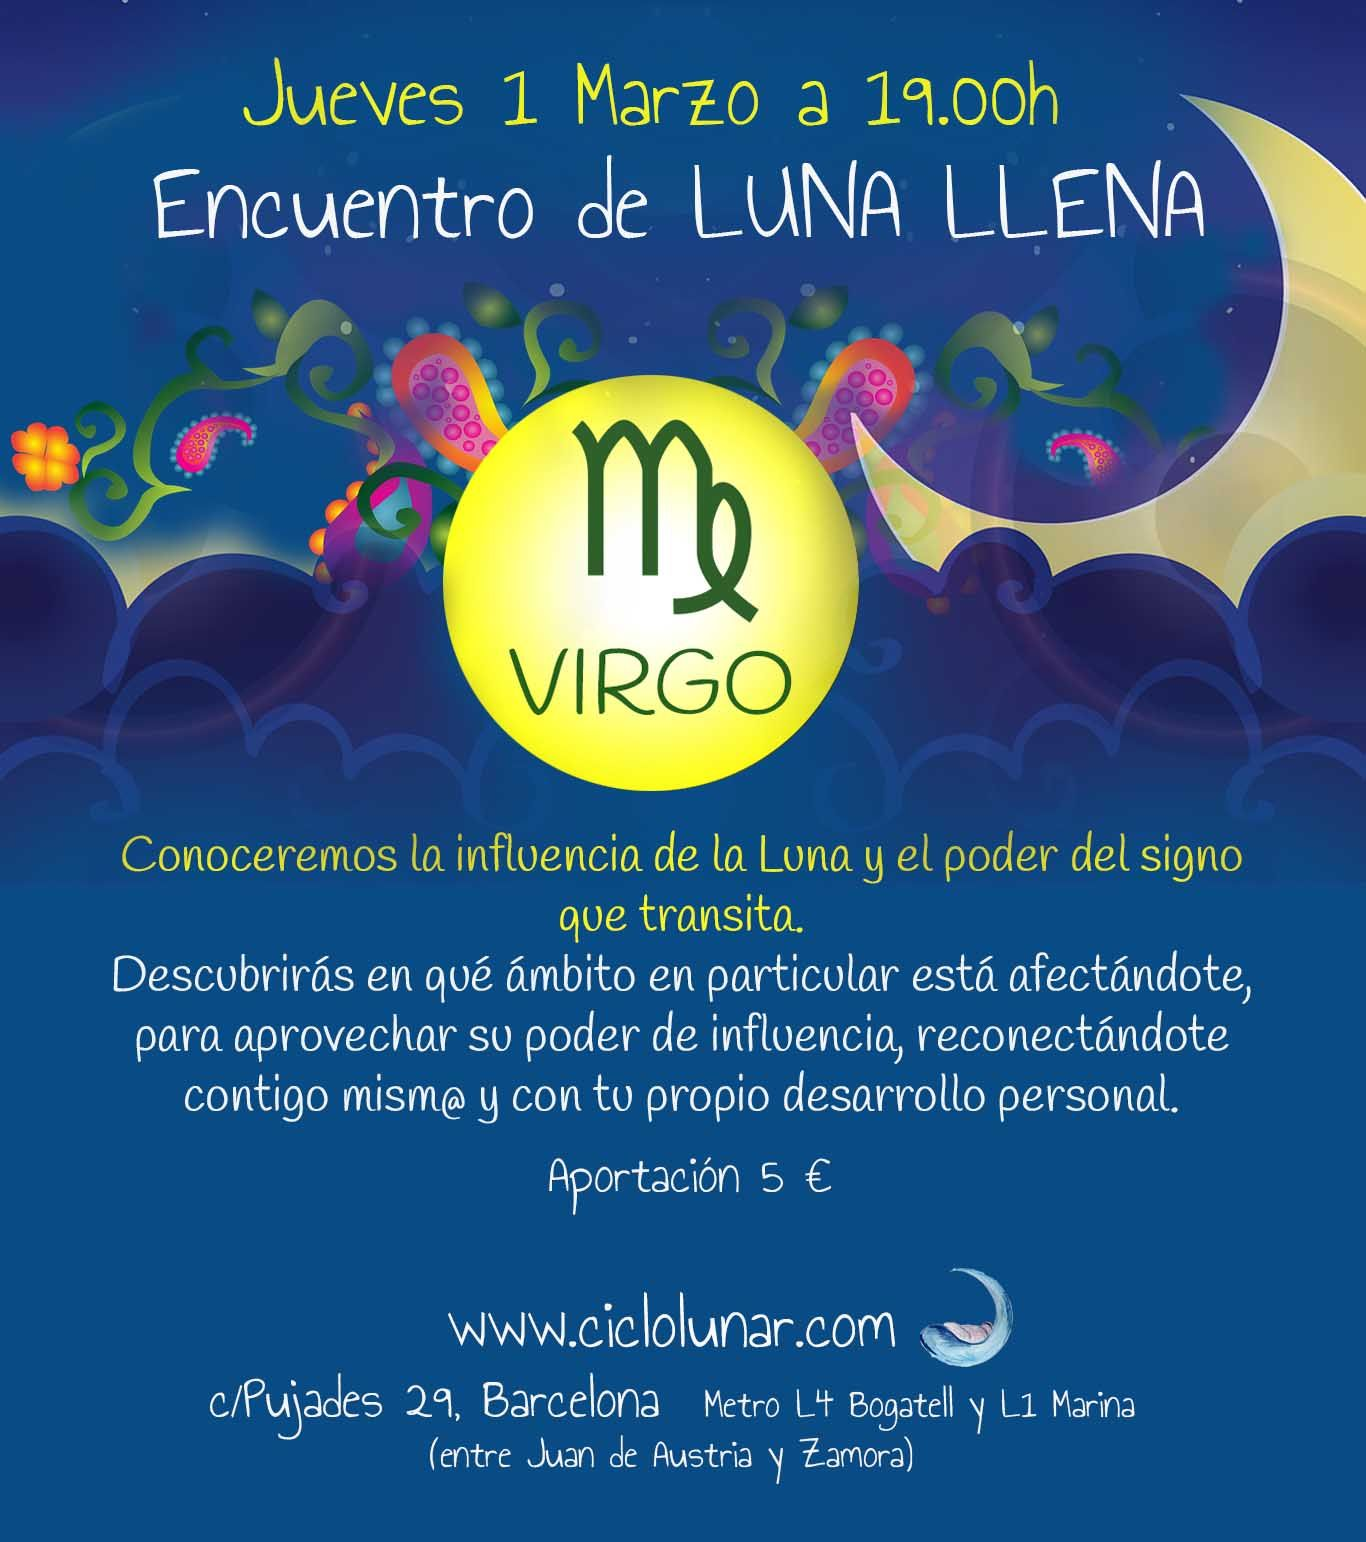 Encuentro Luna Llena Online Luna Llena De Virgo Viernes 26 Feb18 30h Luna Llena Ciclo Lunar Encuentro